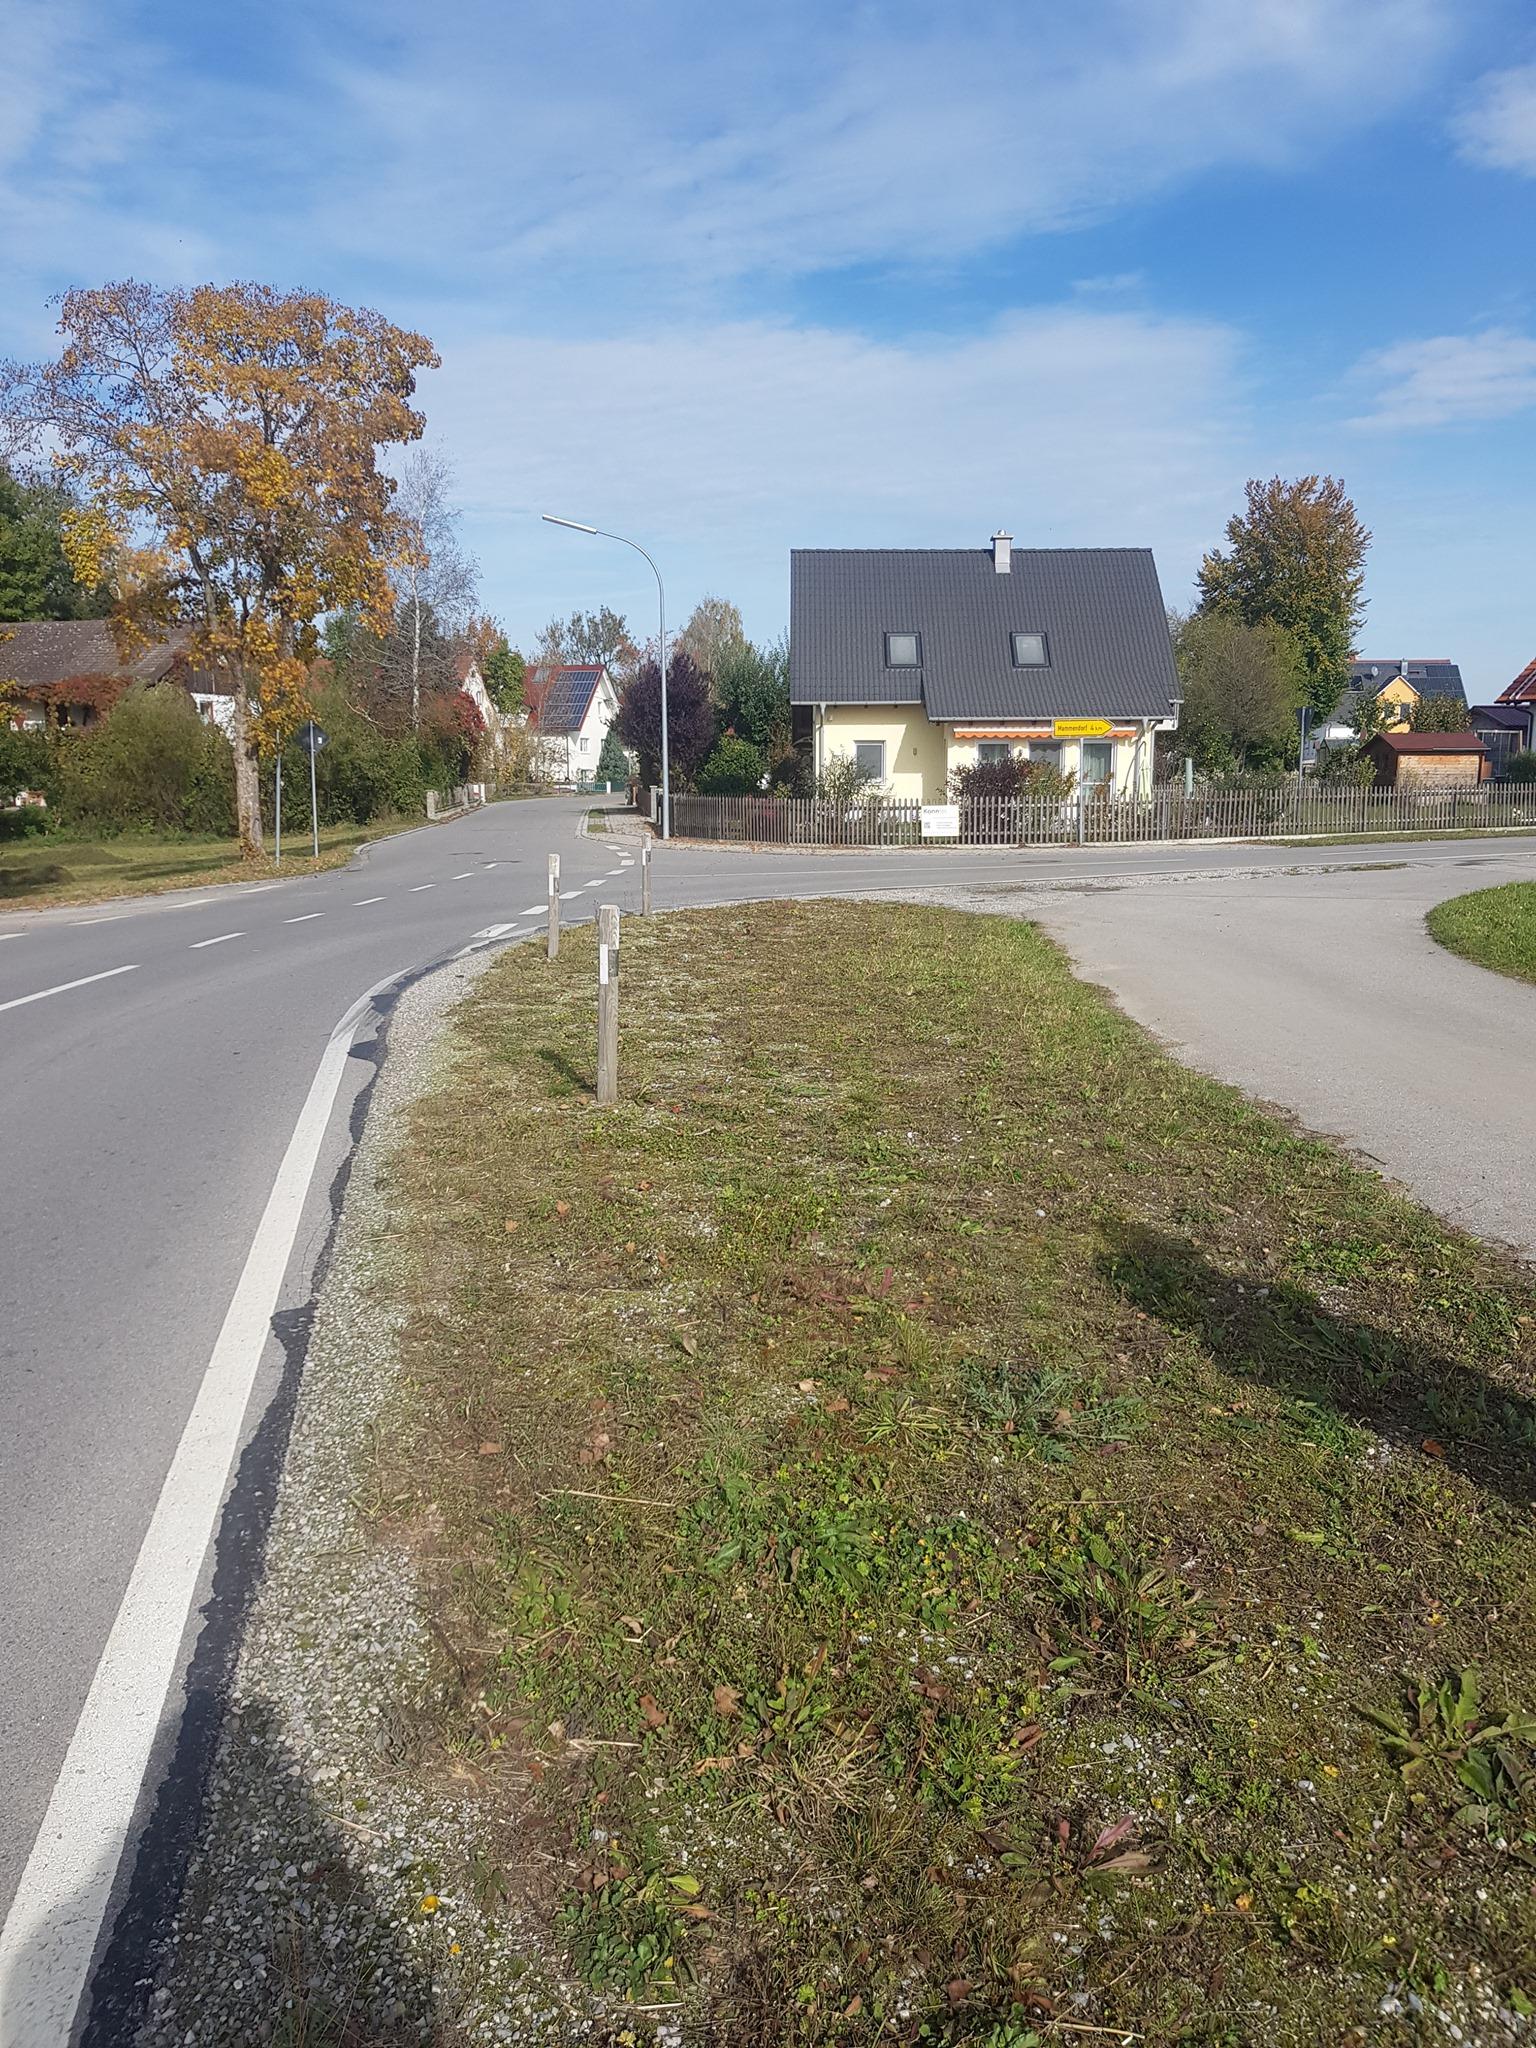 Nassenhausen Süd, wohl verkehrsbedingt abgemäht (C) Antonia Raith